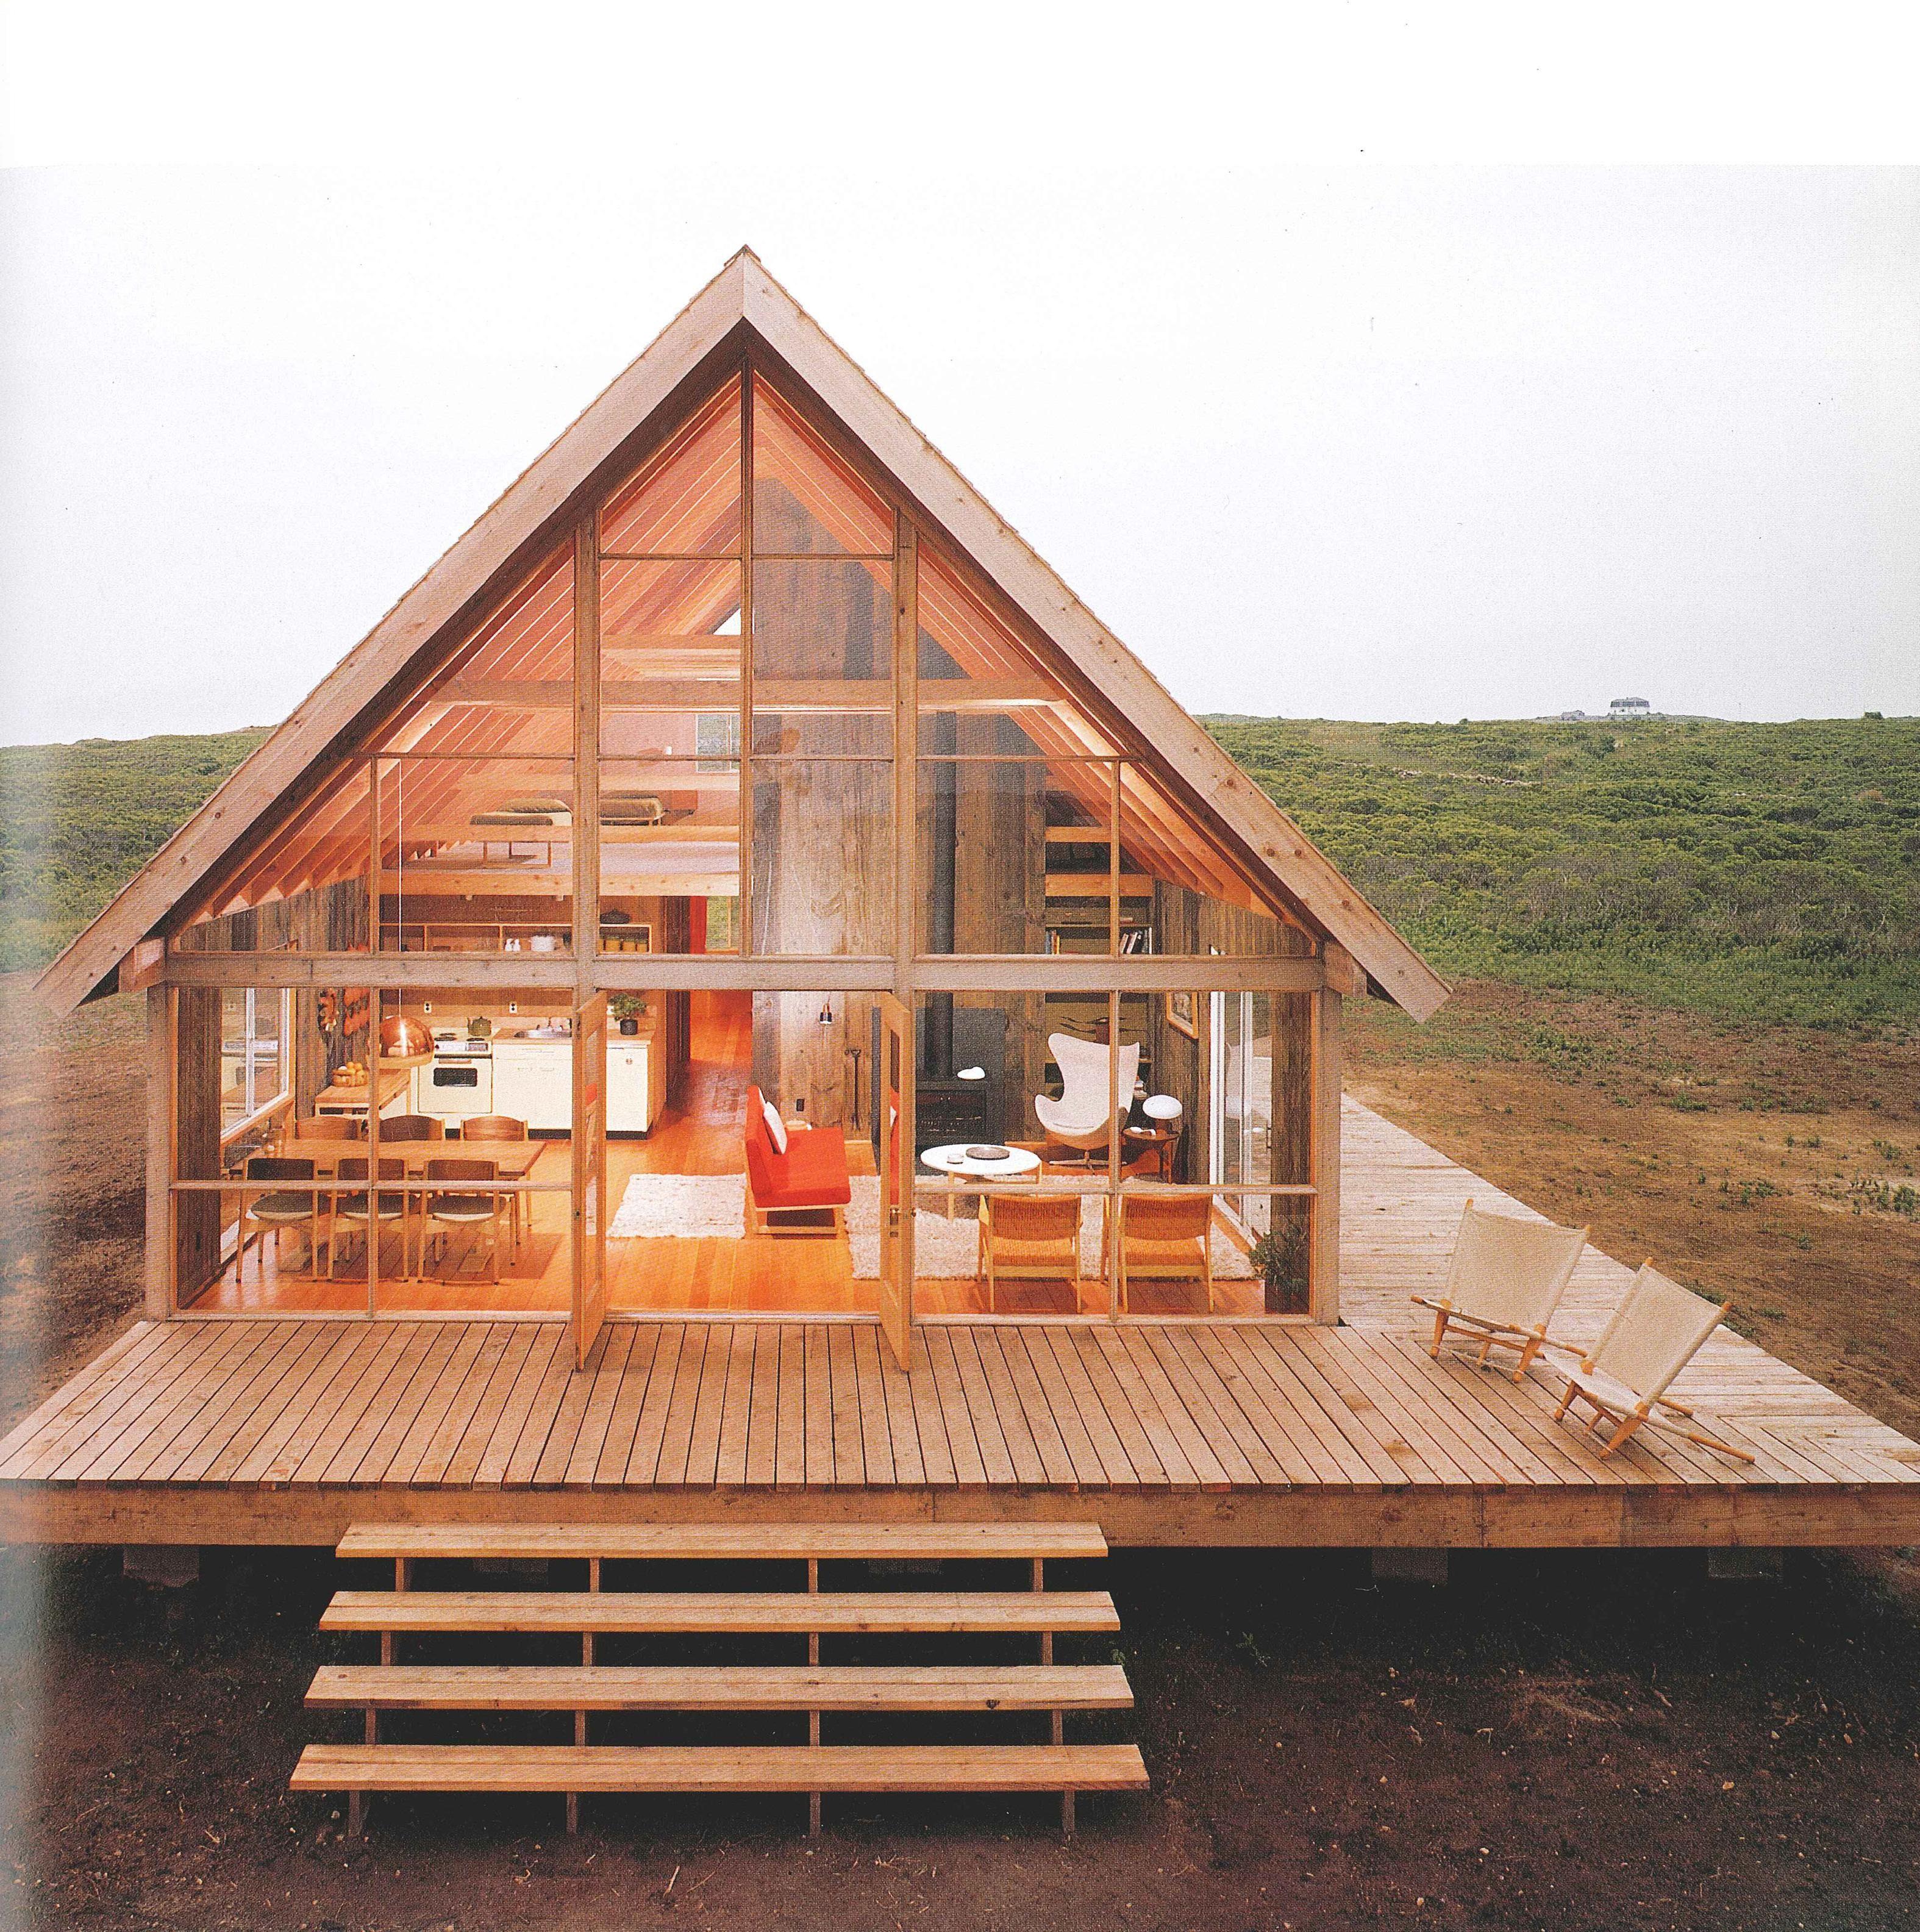 Compact Timber Frame Jens Risom Kit Homes Modern Tiny House